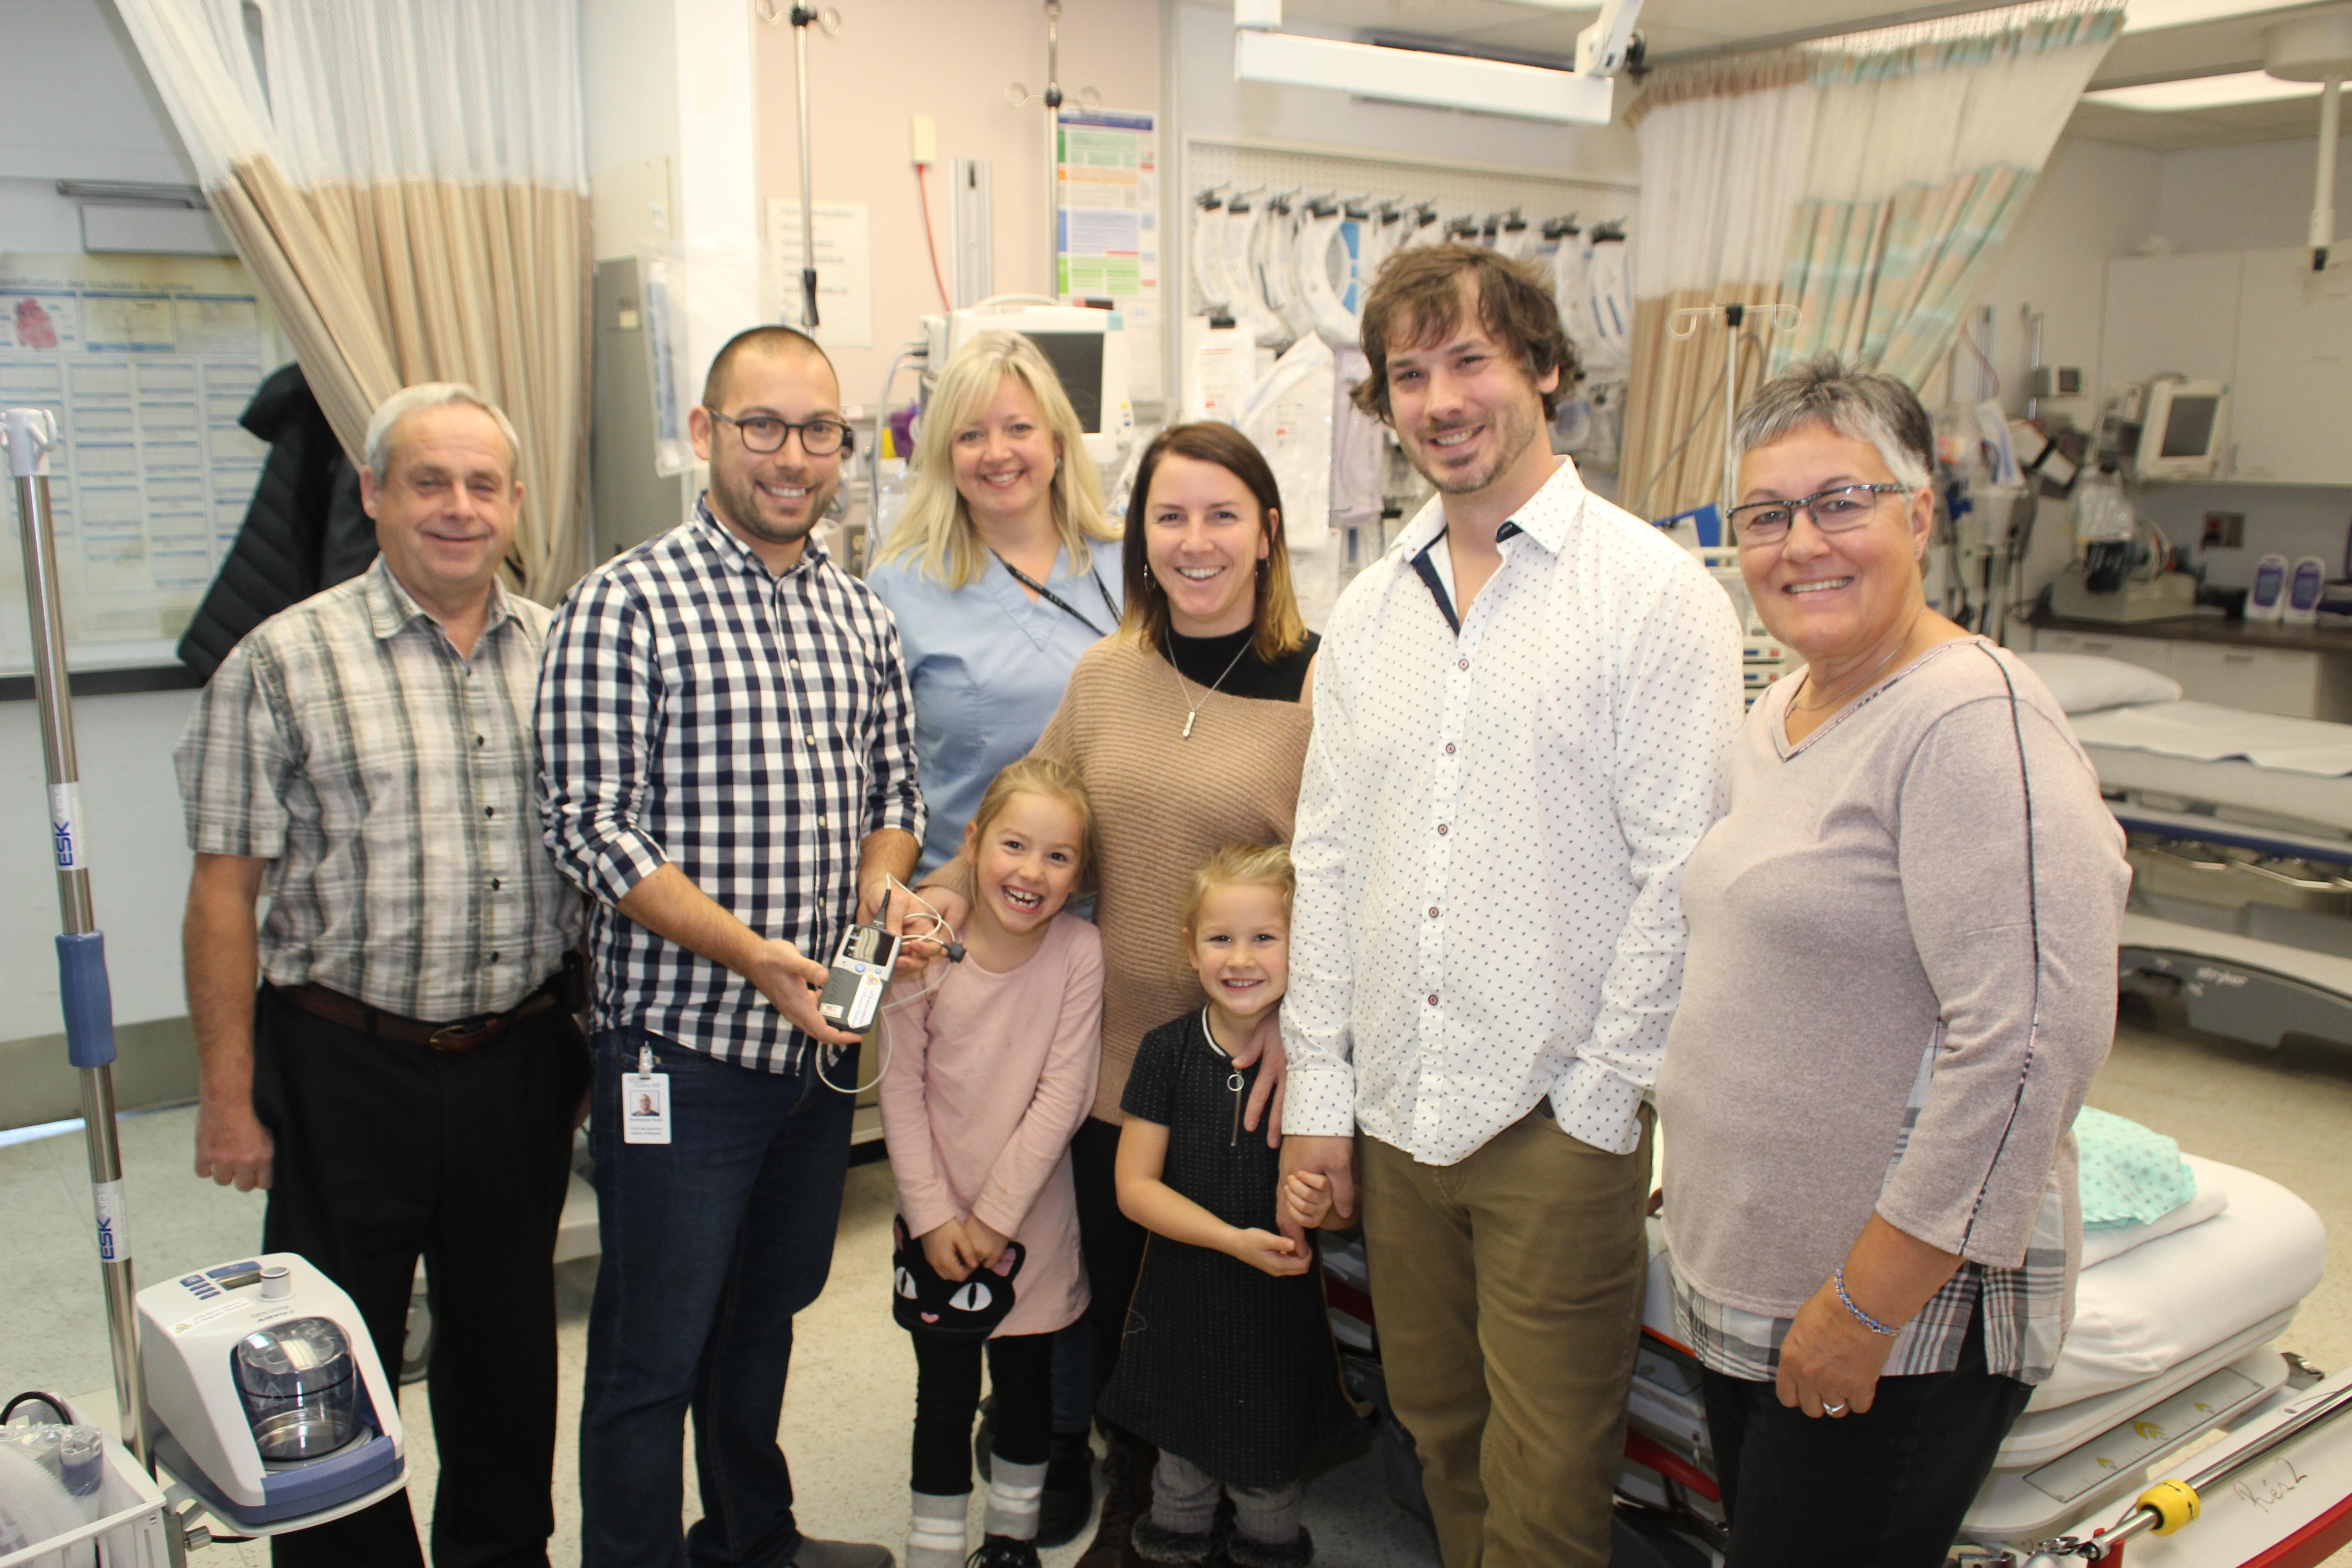 Famille Carignan Lachance Urgence